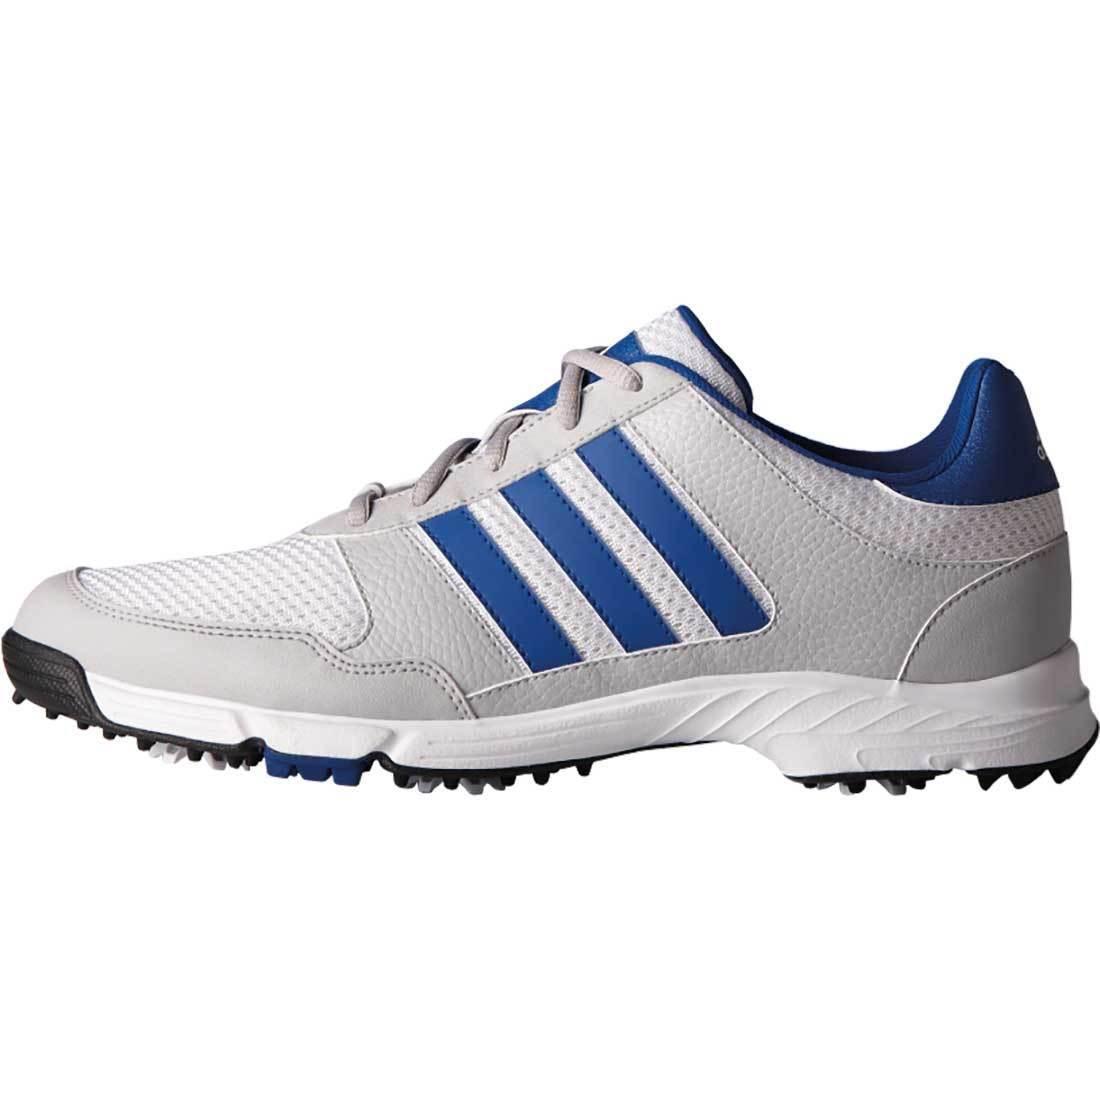 Adidas Uomo Tech Da Q44946 Ampia Risposta Scarpe Da Tech Golf Bianca / Silver cab604